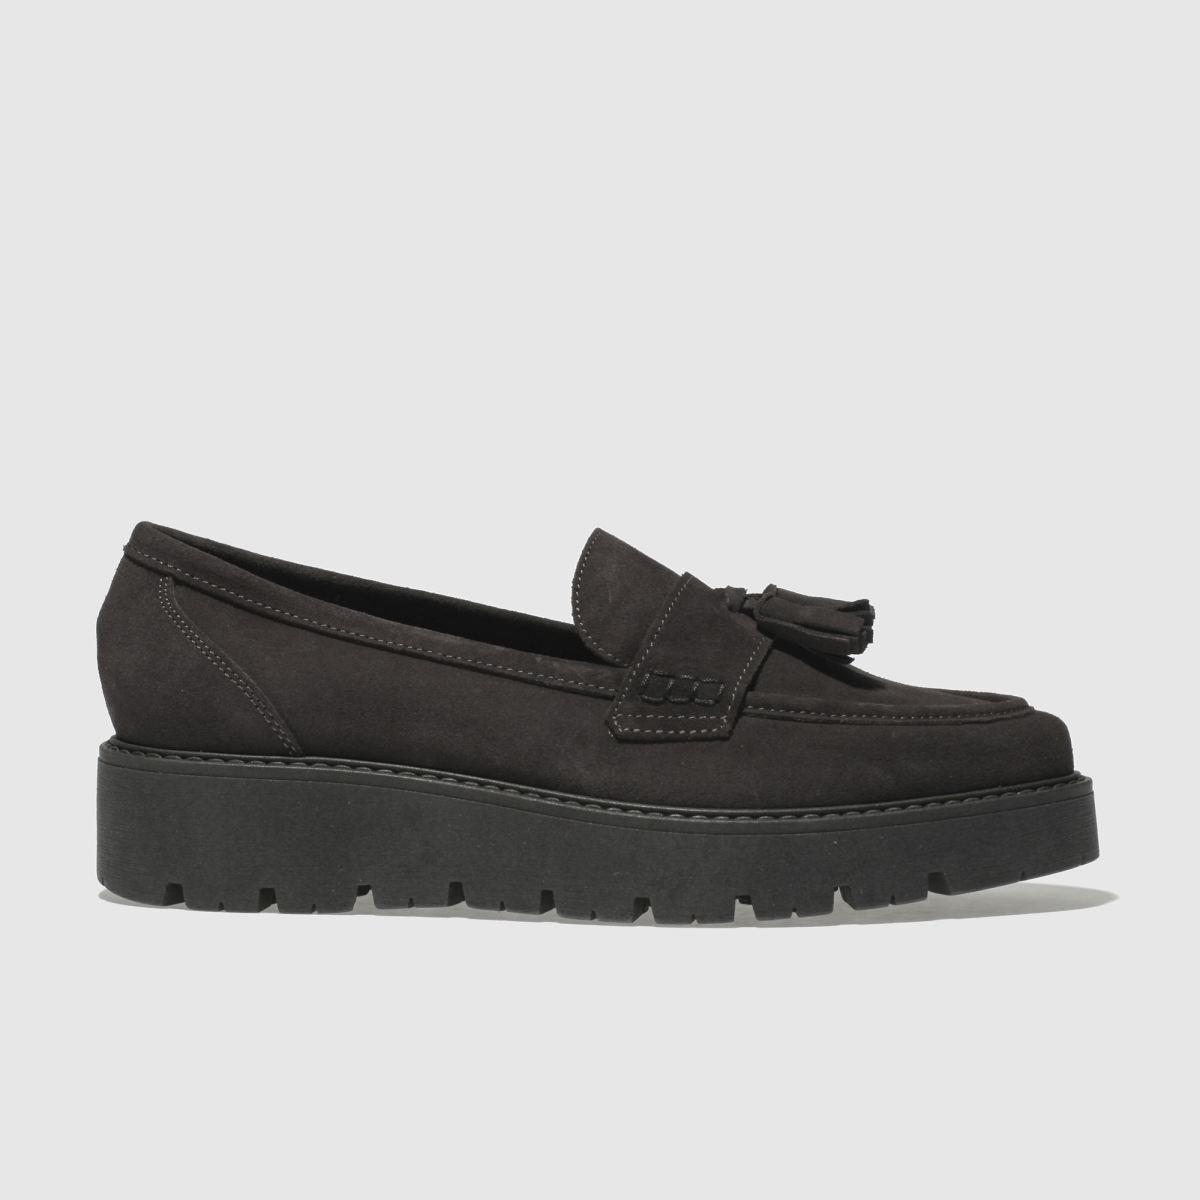 Schuh Dark Grey Stroller Flat Shoes